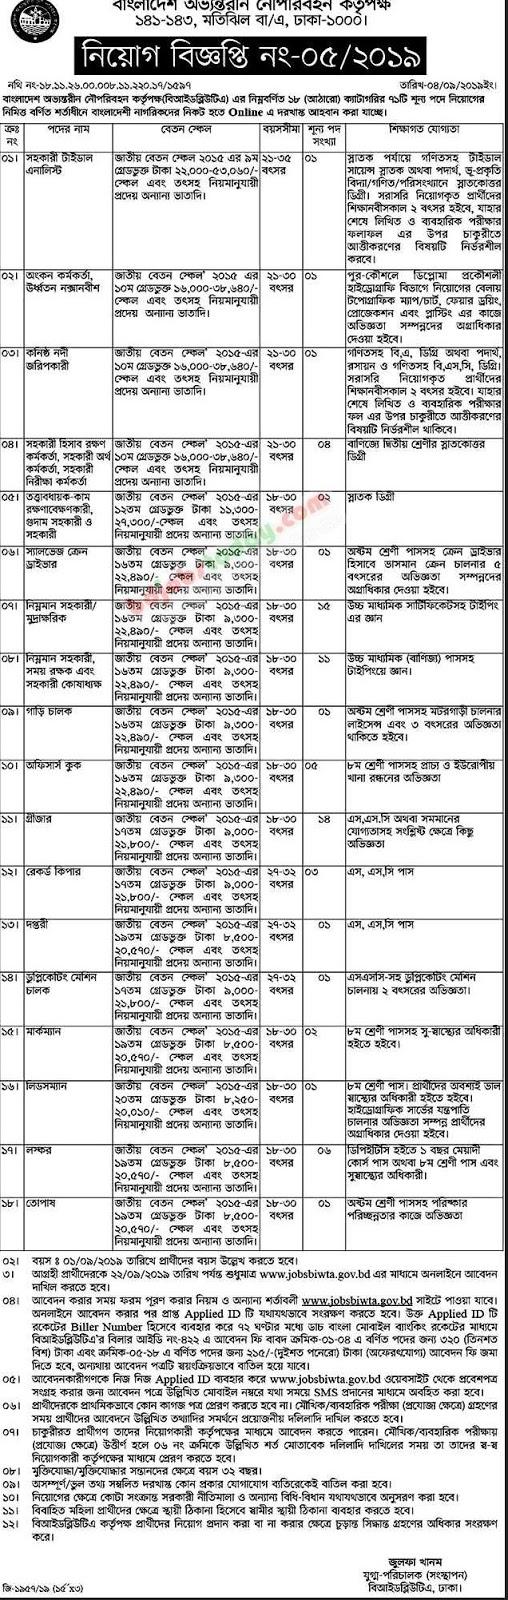 Bangladesh Inland Water Transport Authority BIWTA job